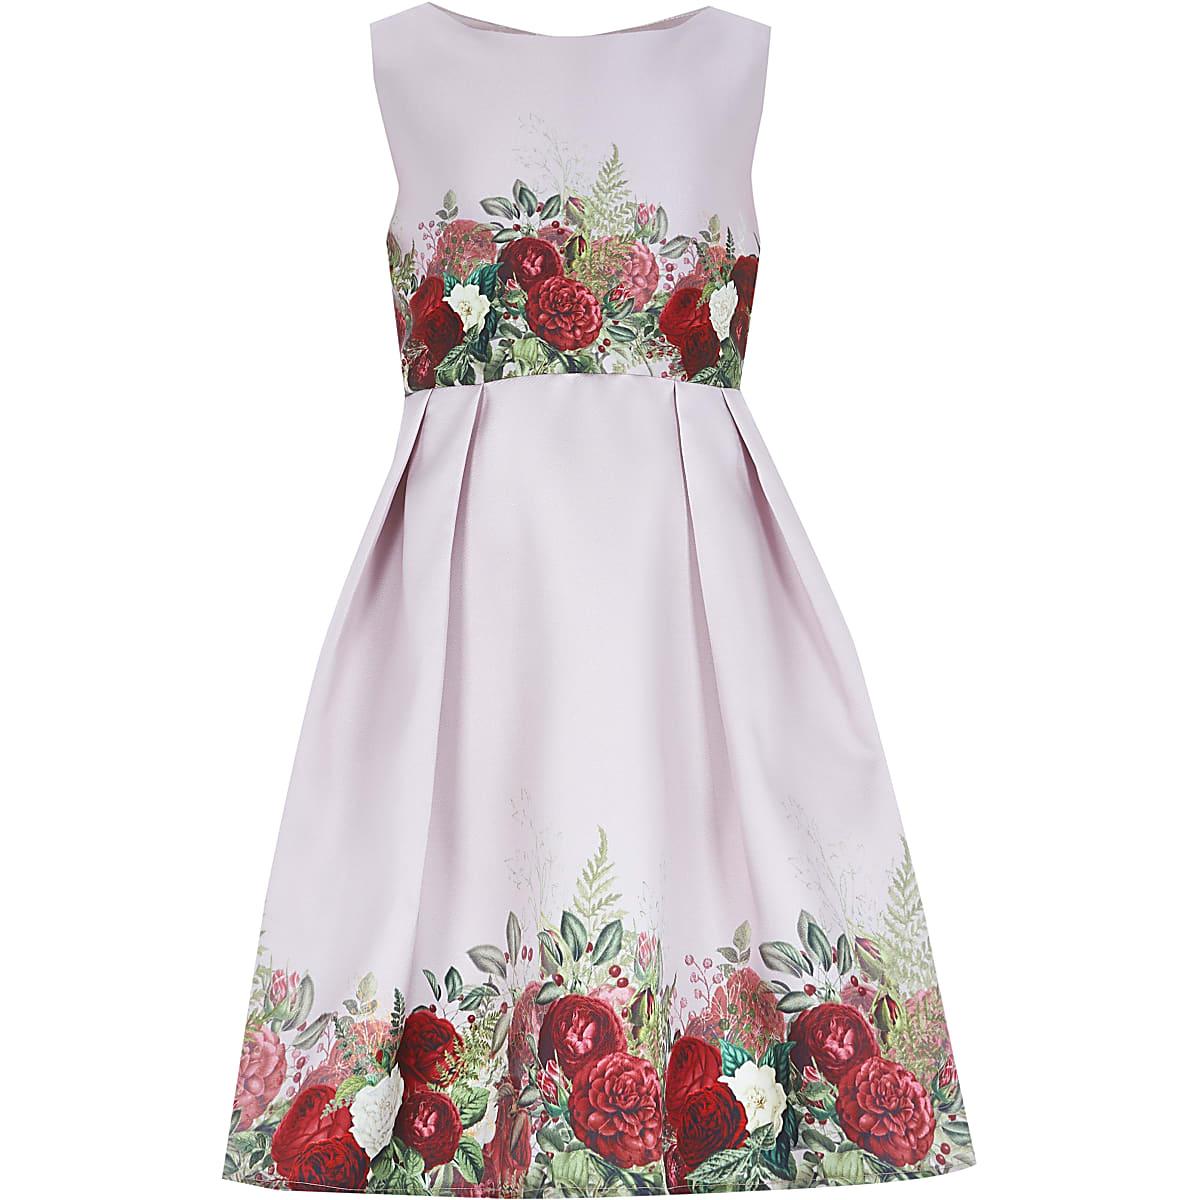 Girls Chi Chi pink floral dress